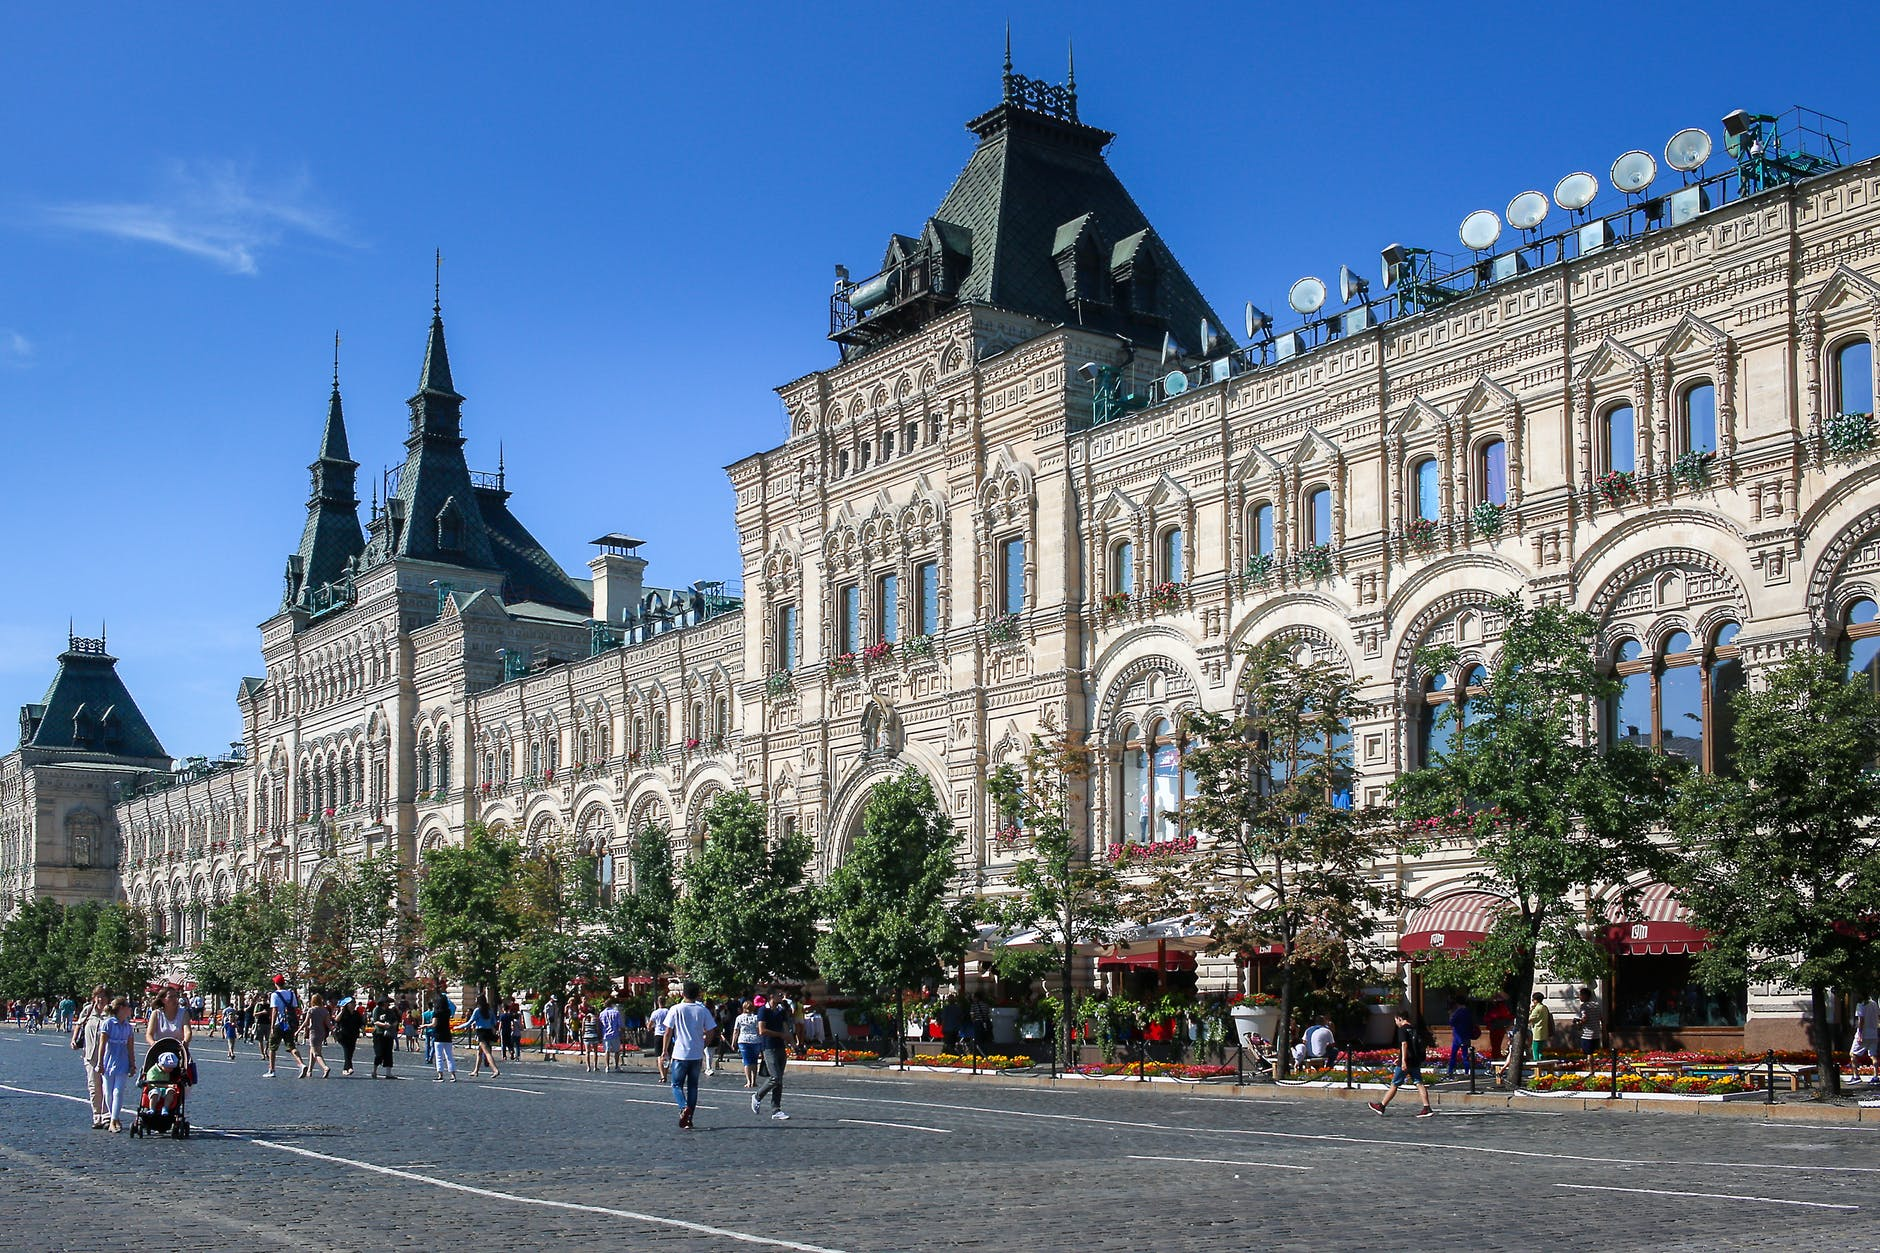 moscow-russia-soviet-union-facade-161112.jpeg